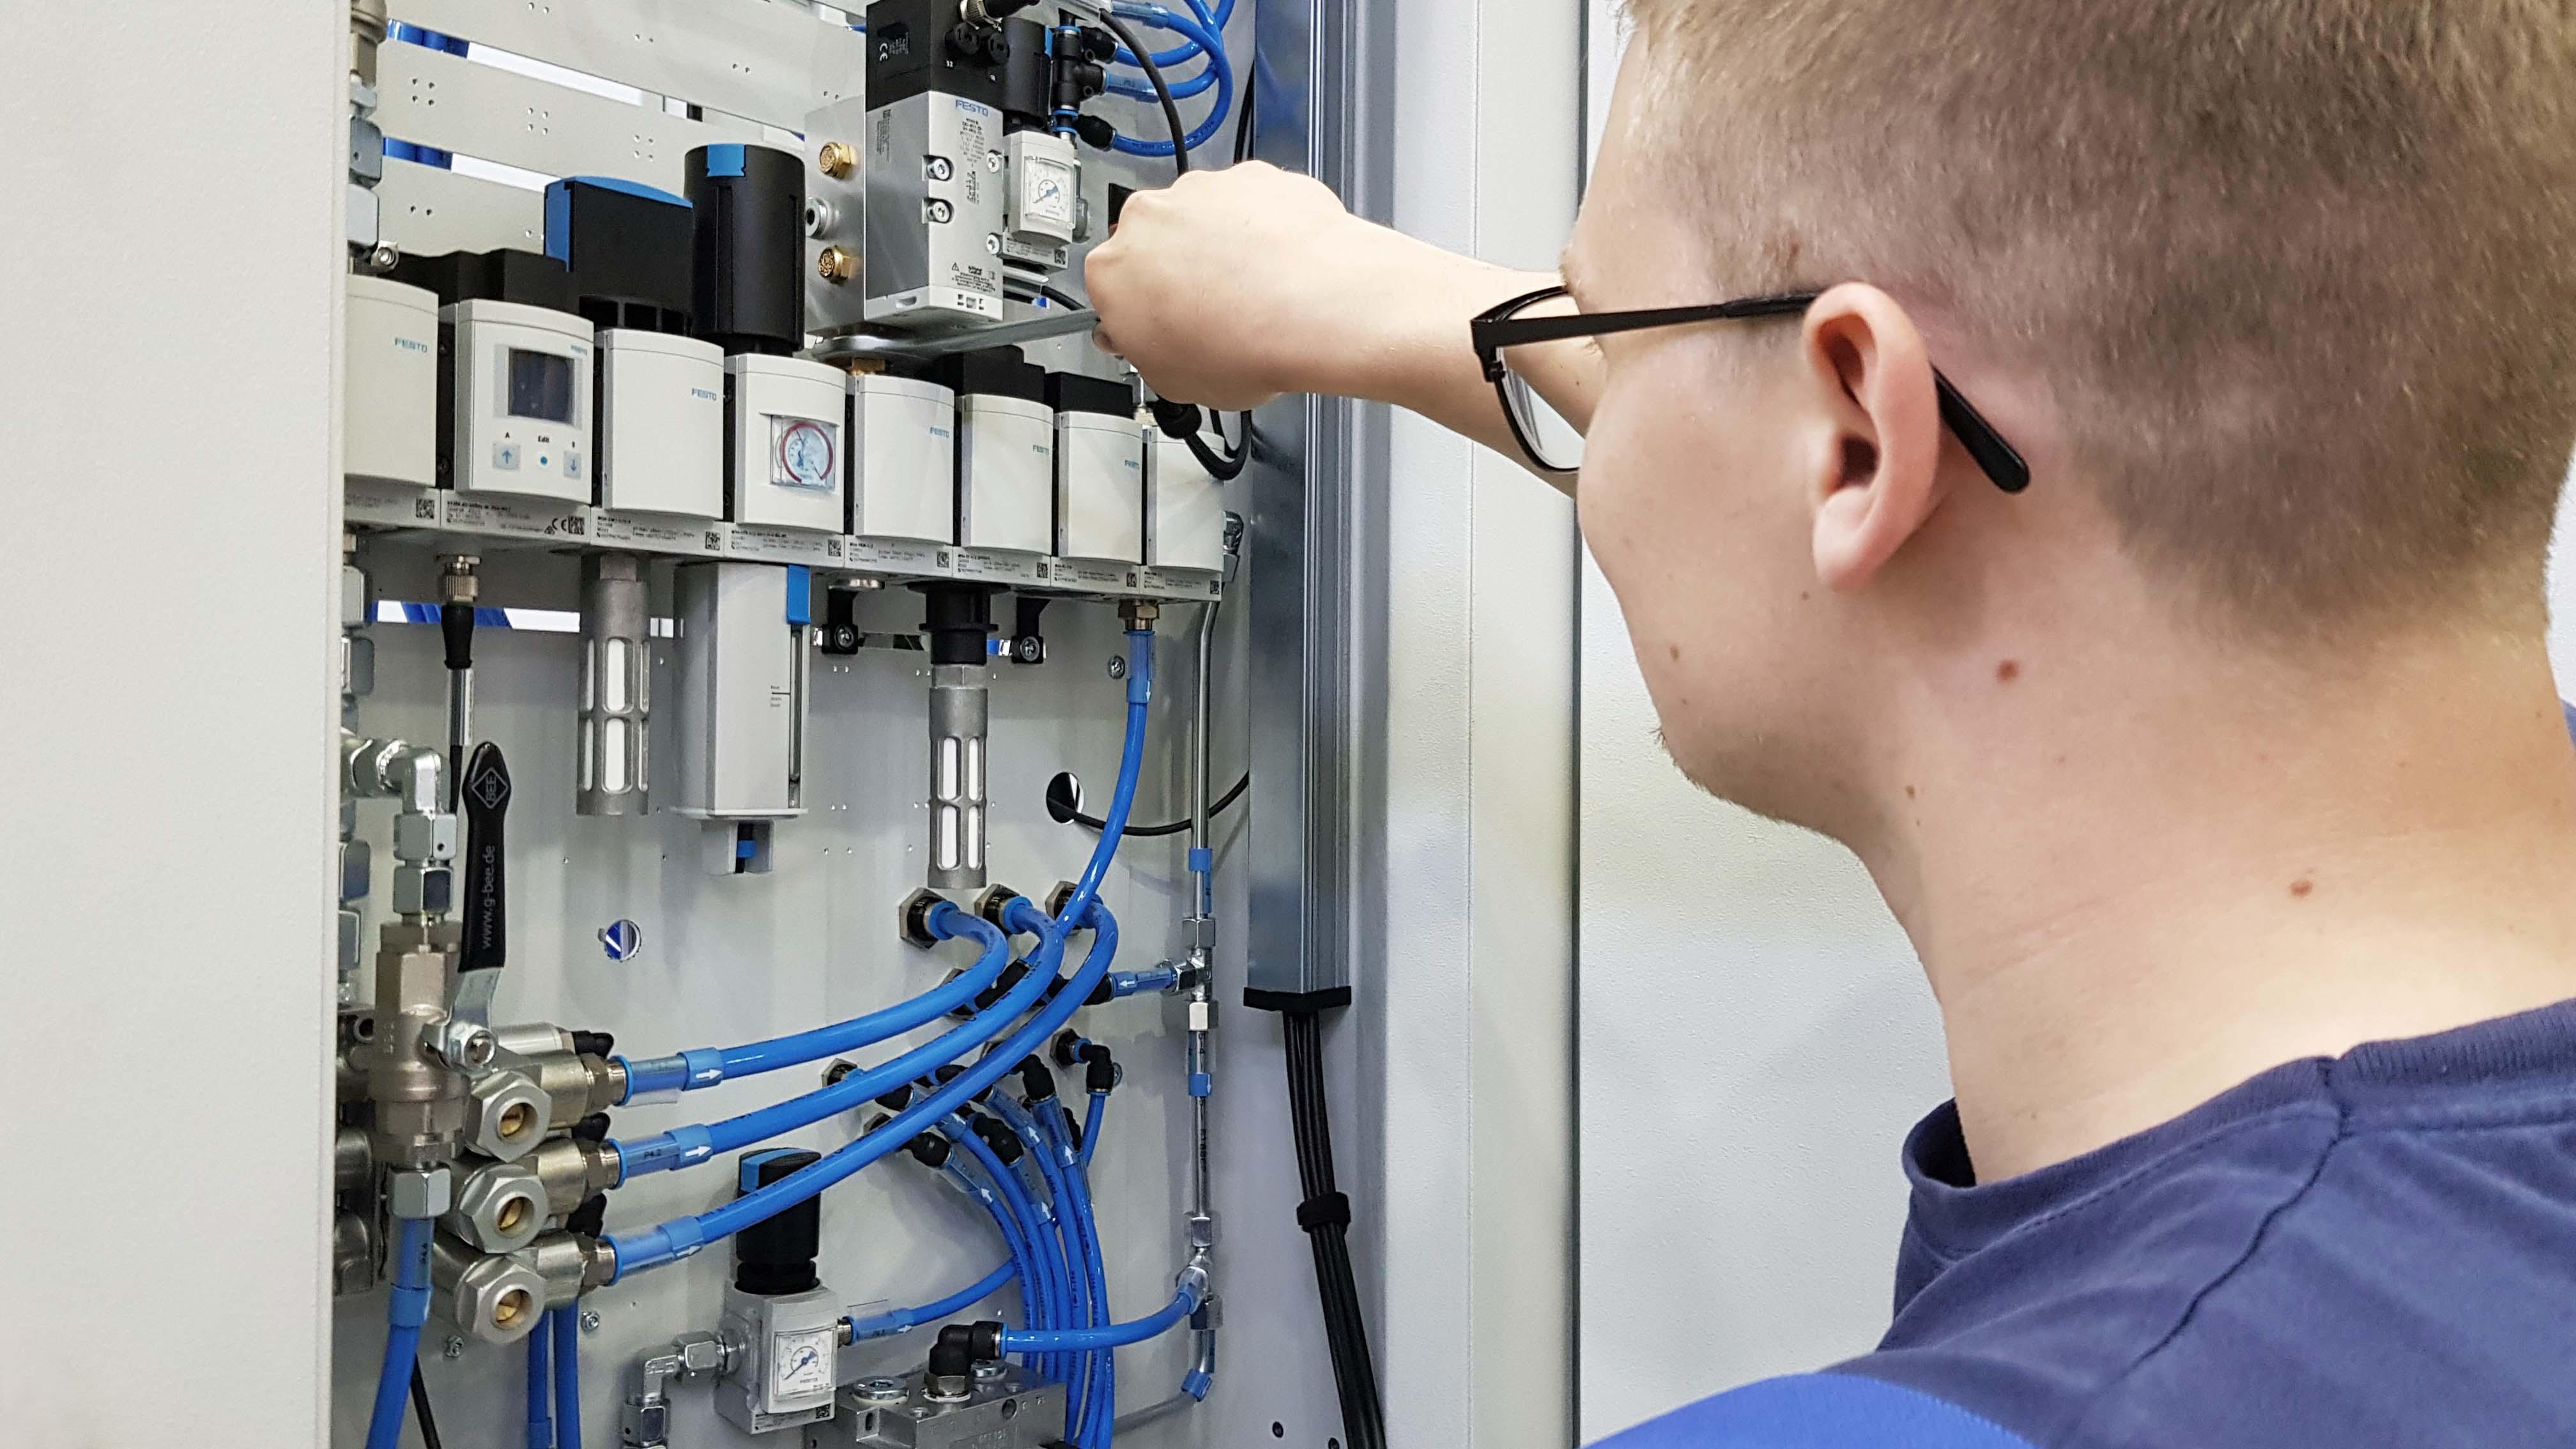 Werkzeugmaschinenbau Service: Wartung / Machine Tool Service: Maintenance